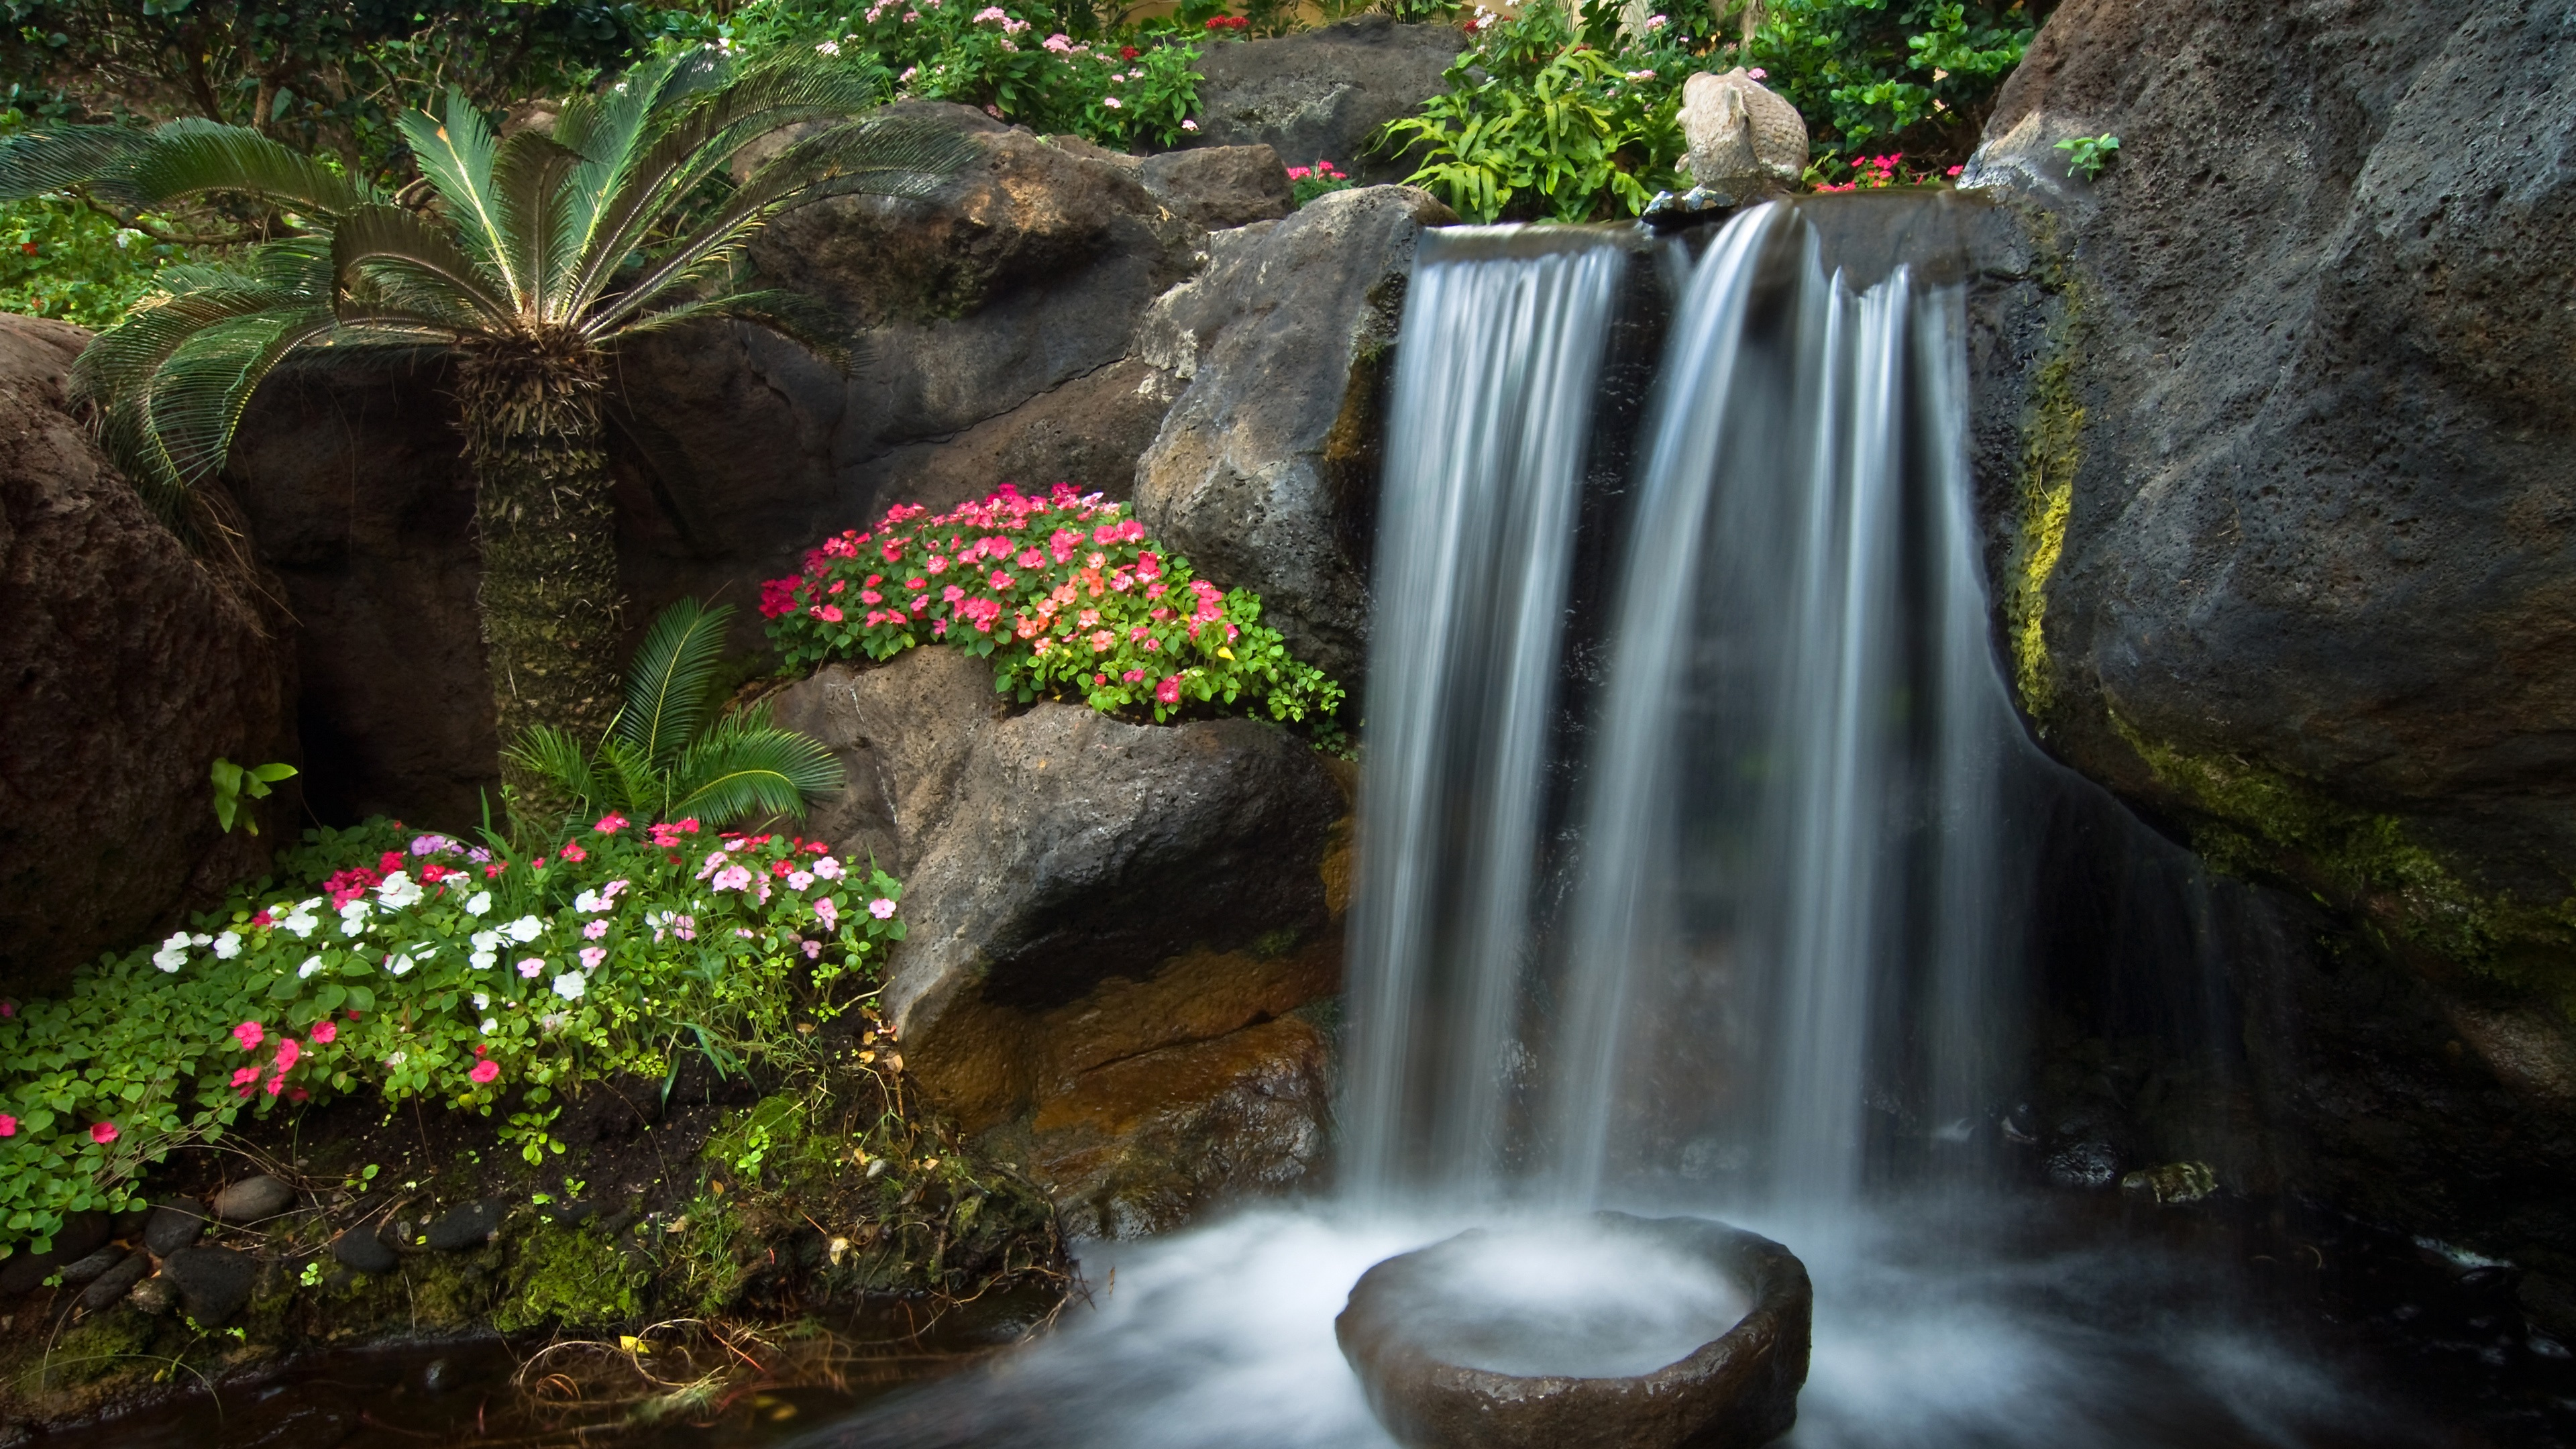 Fondos de pantalla jard n peque a cascada piedras for Cascadas en piedra para jardines